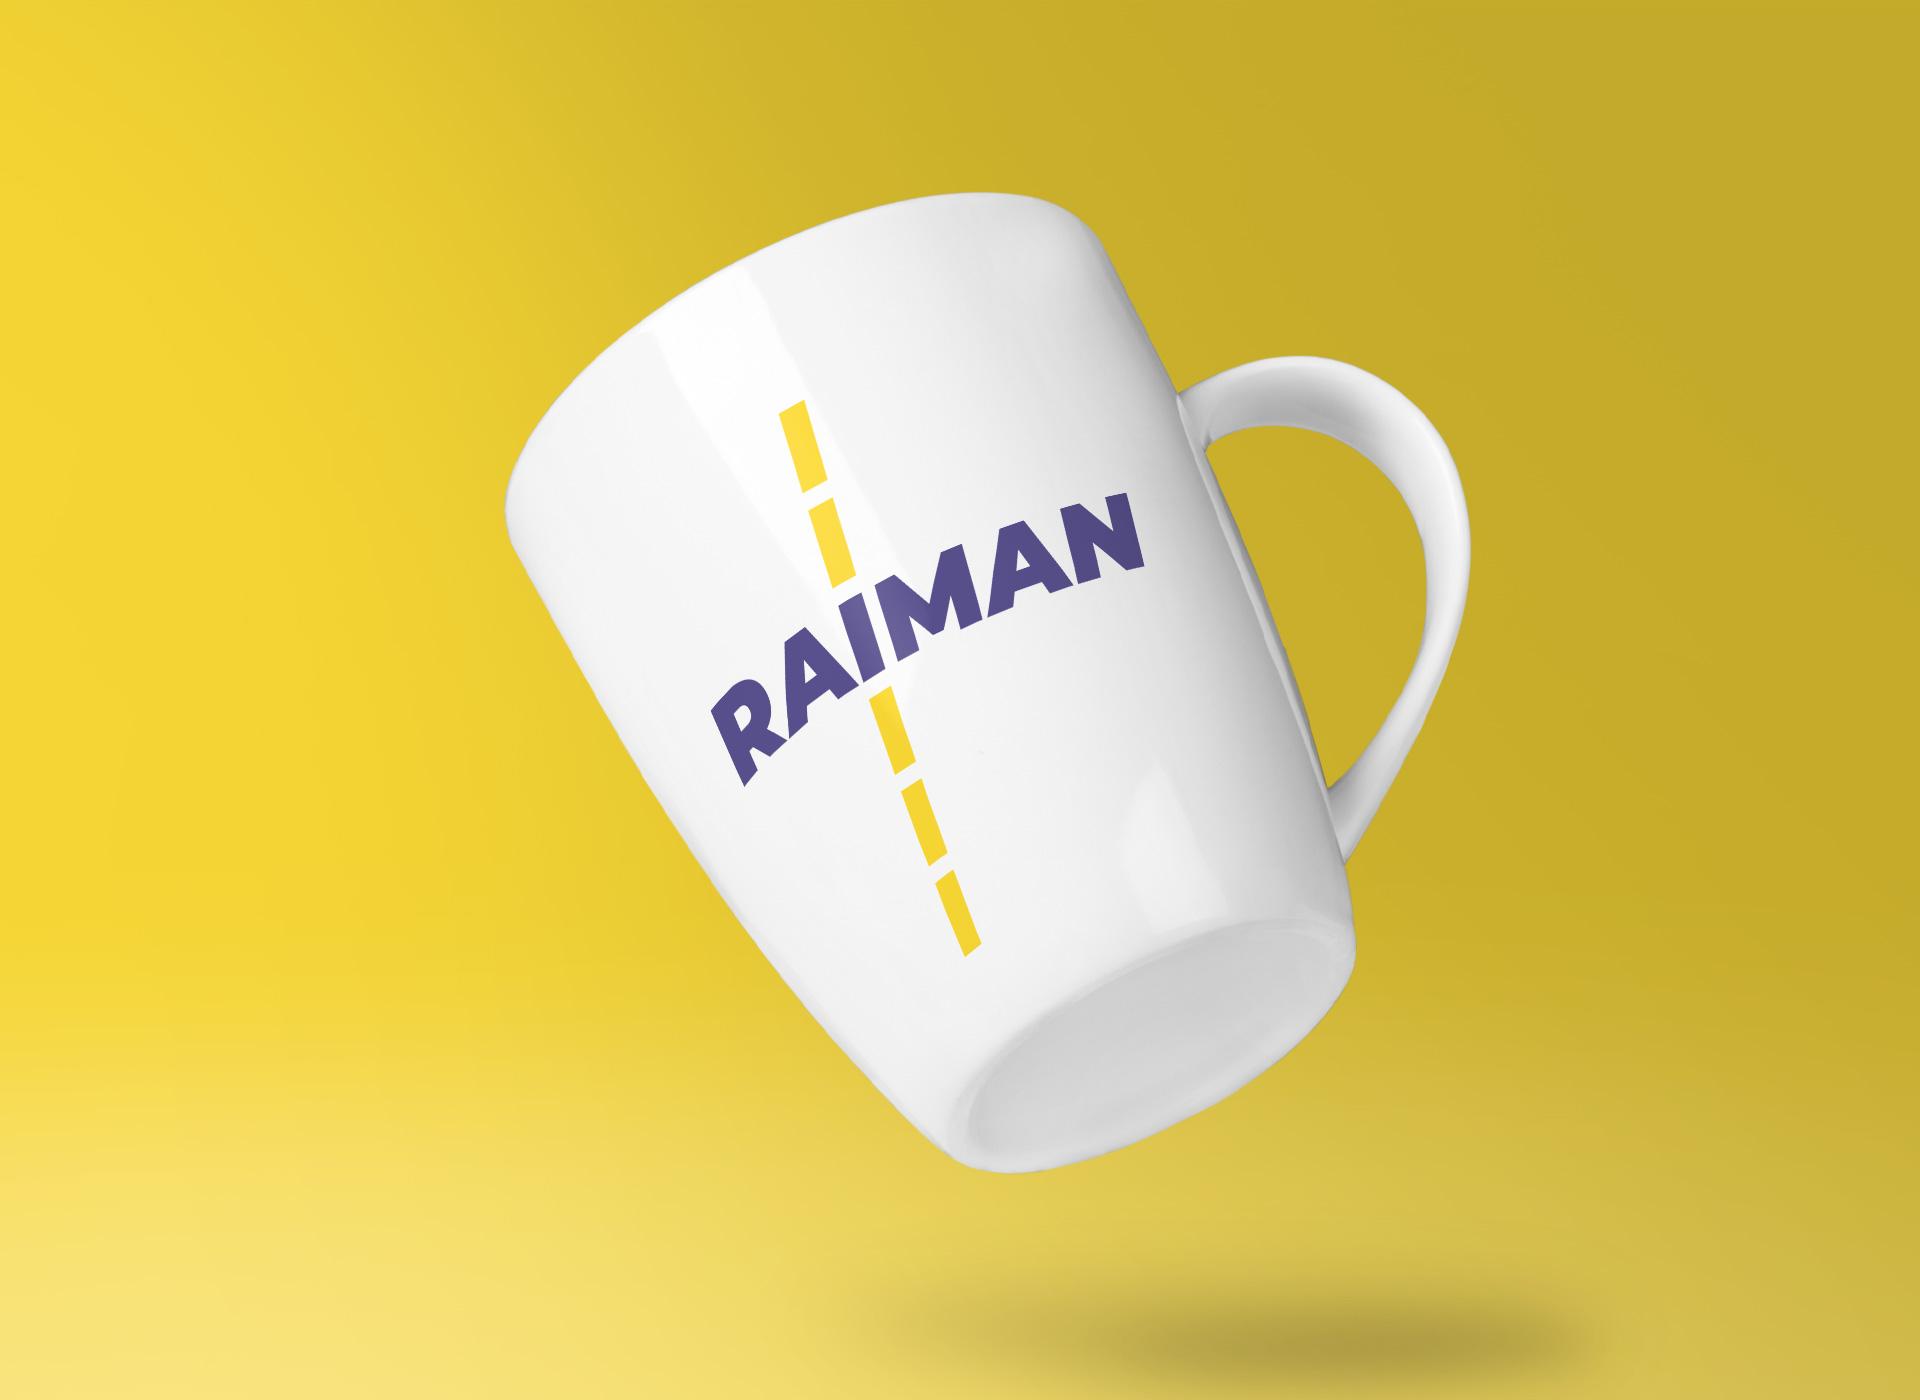 raiman portofolio inoveo mug